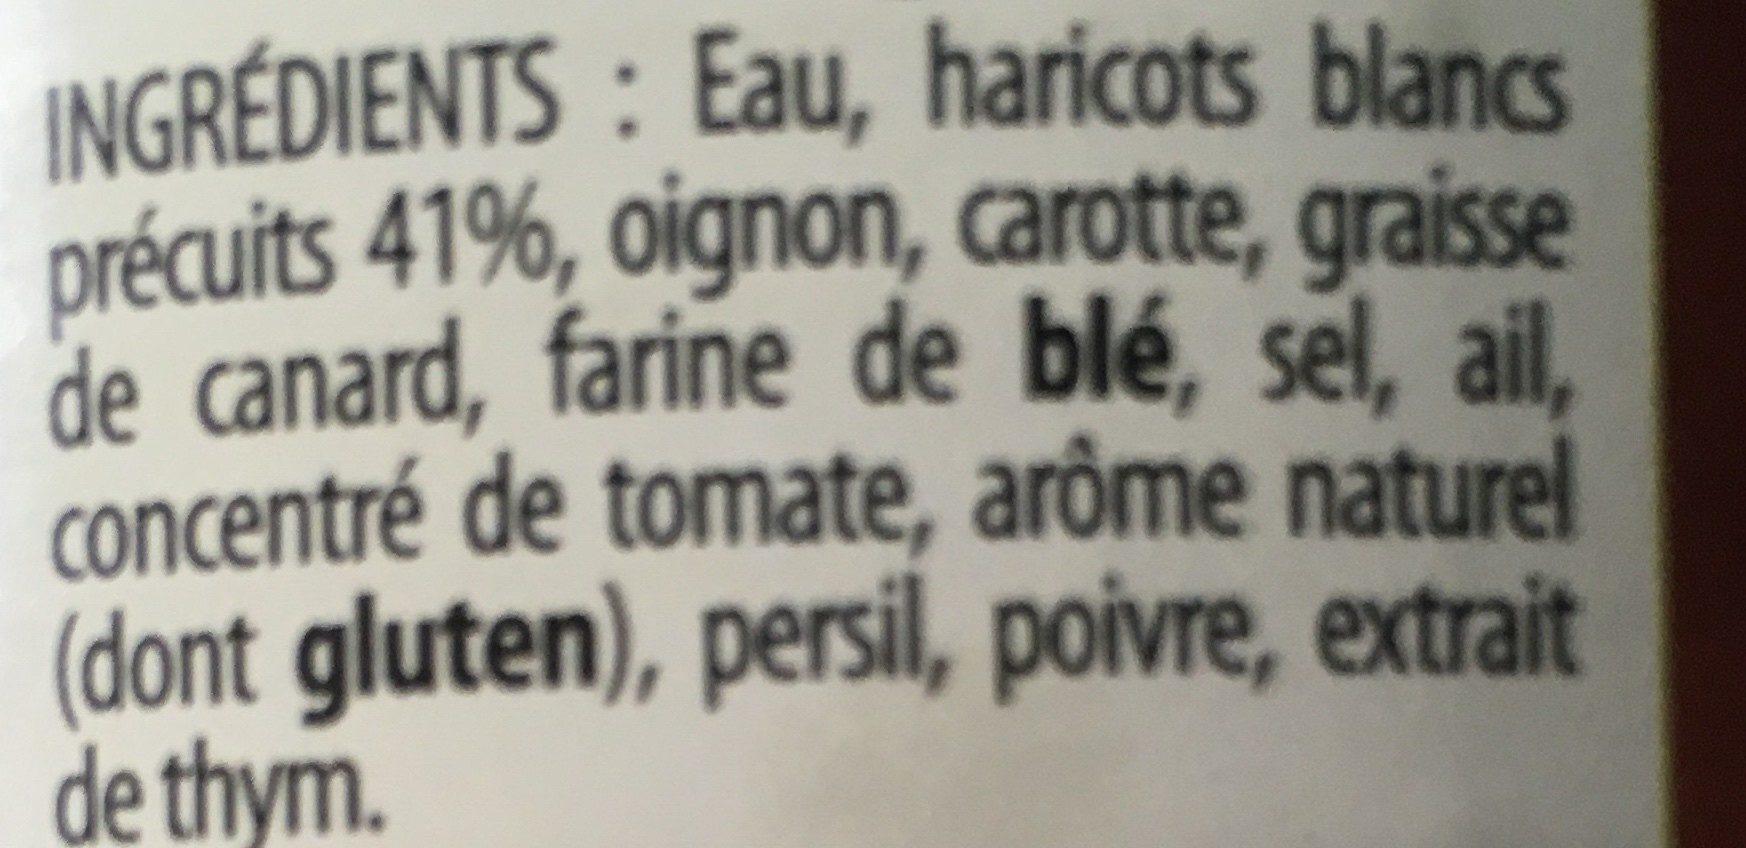 Haricots blancs cuisinés - Ingredients - fr